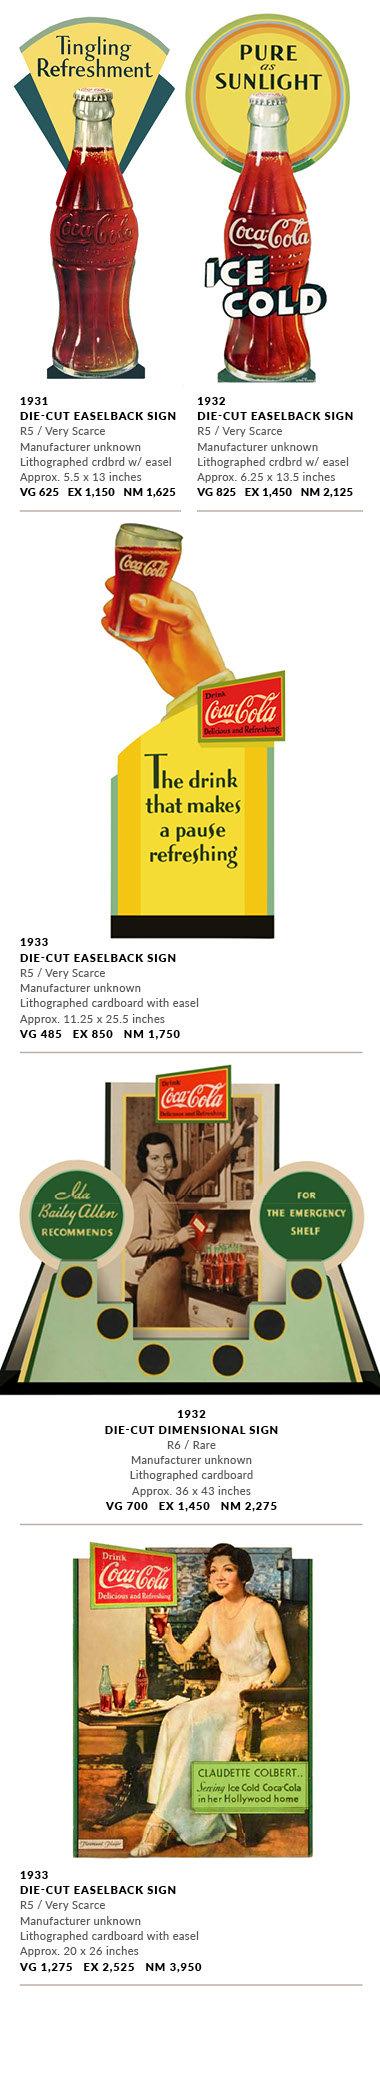 1930-1949DieCutsPHONE_4.jpg